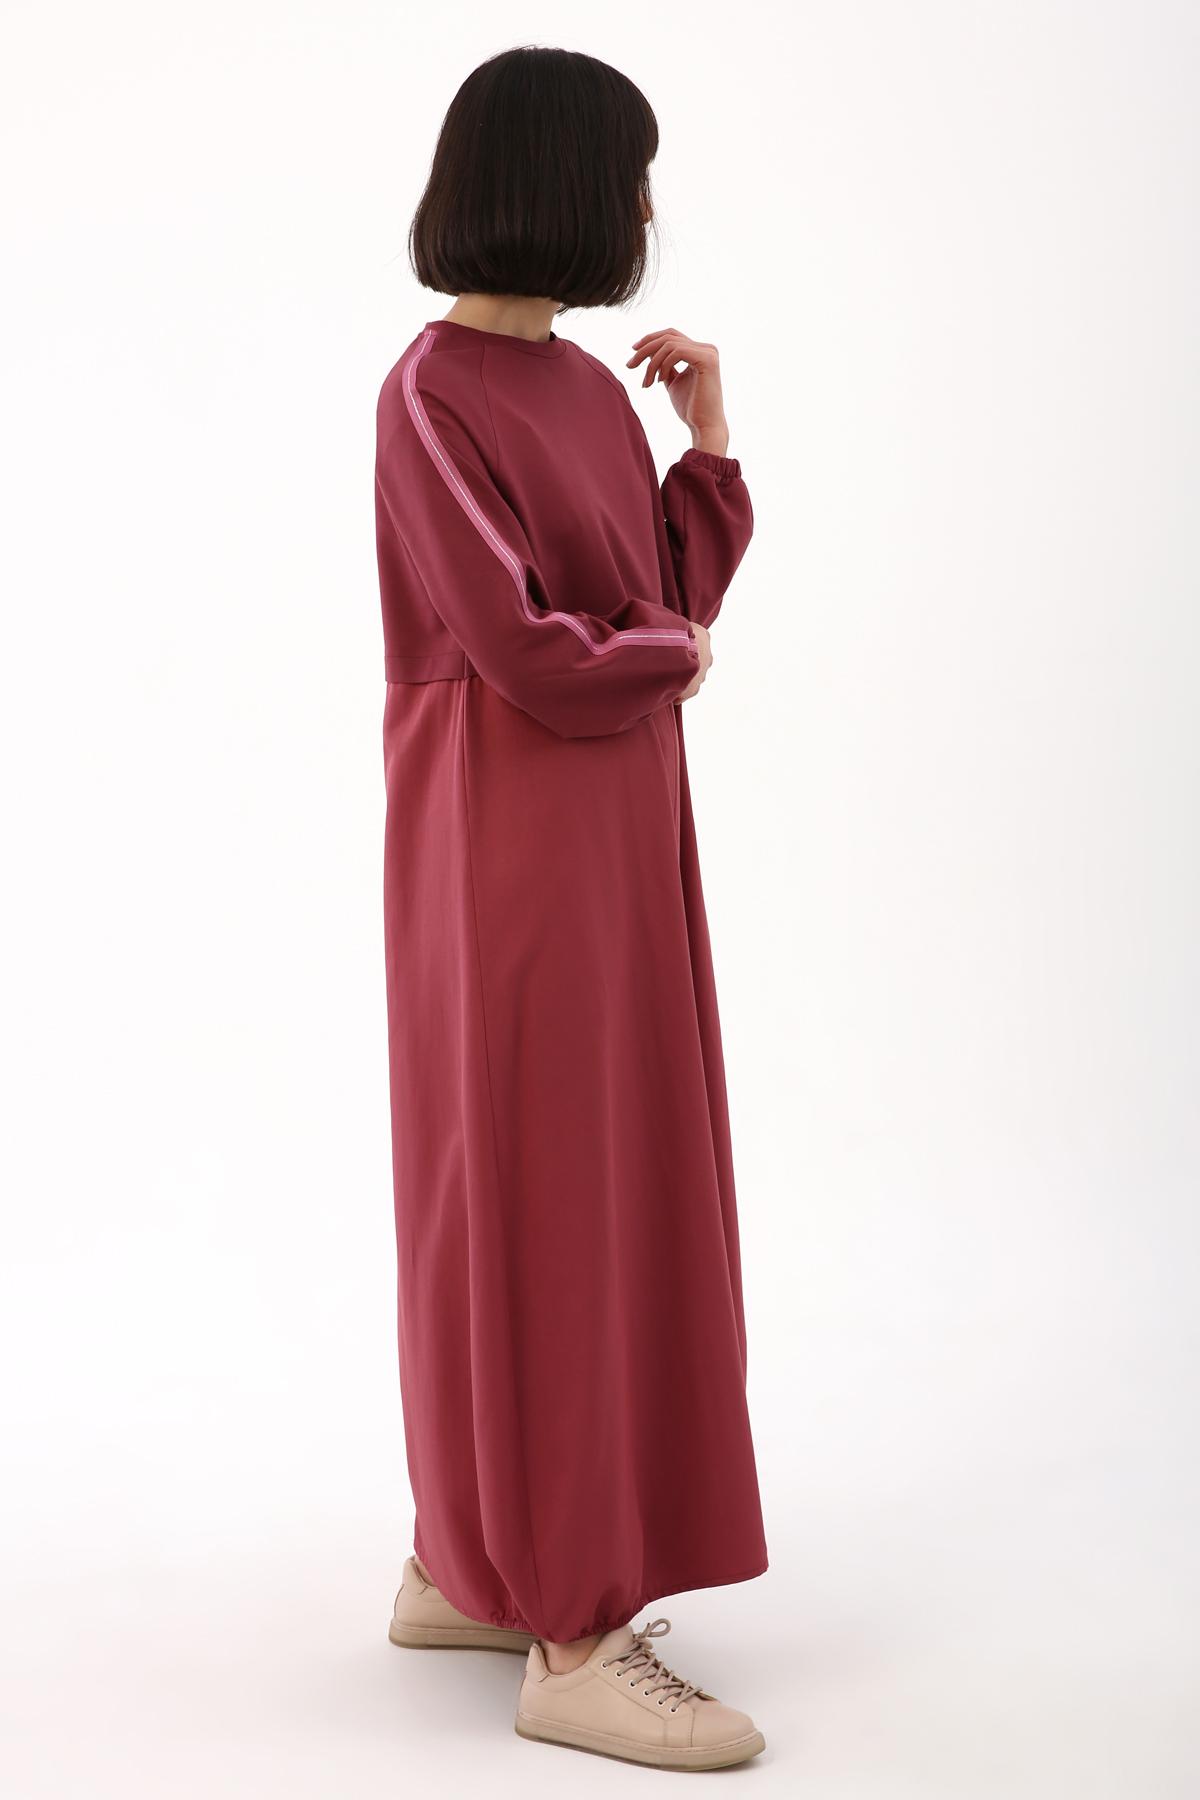 Sleeve Detailed Tent Model Dress